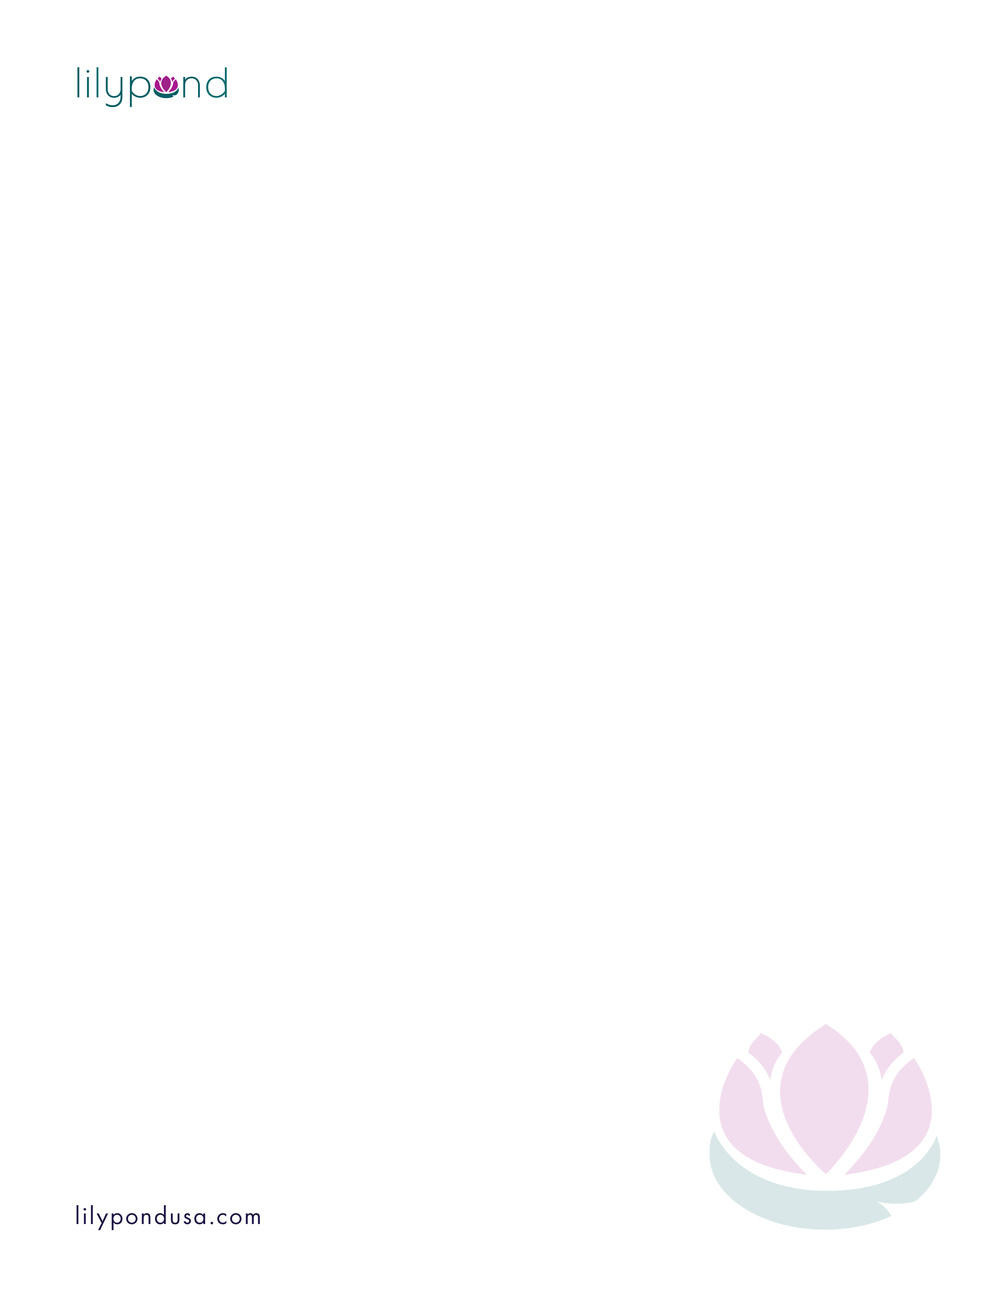 Lilypond_lthd-01.jpg